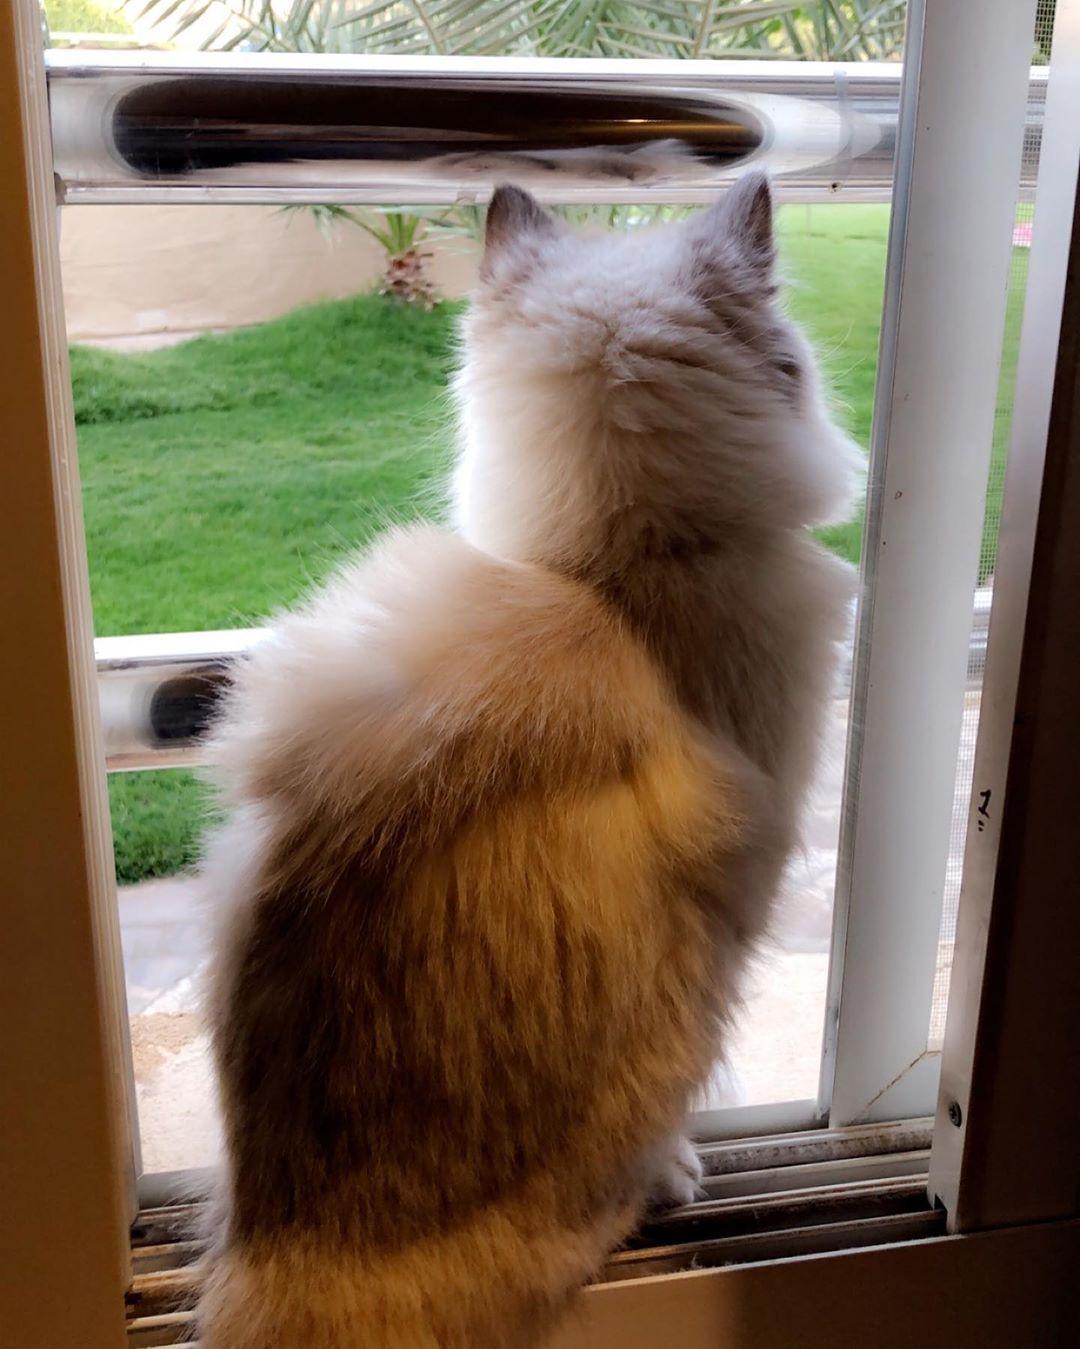 My Love Loly Cat Cat Cute Nise قطة بسة كيوت لطيف الرياض حيوانات Animals قط شيرازي قط هملايا قطط قطه Cats Animals